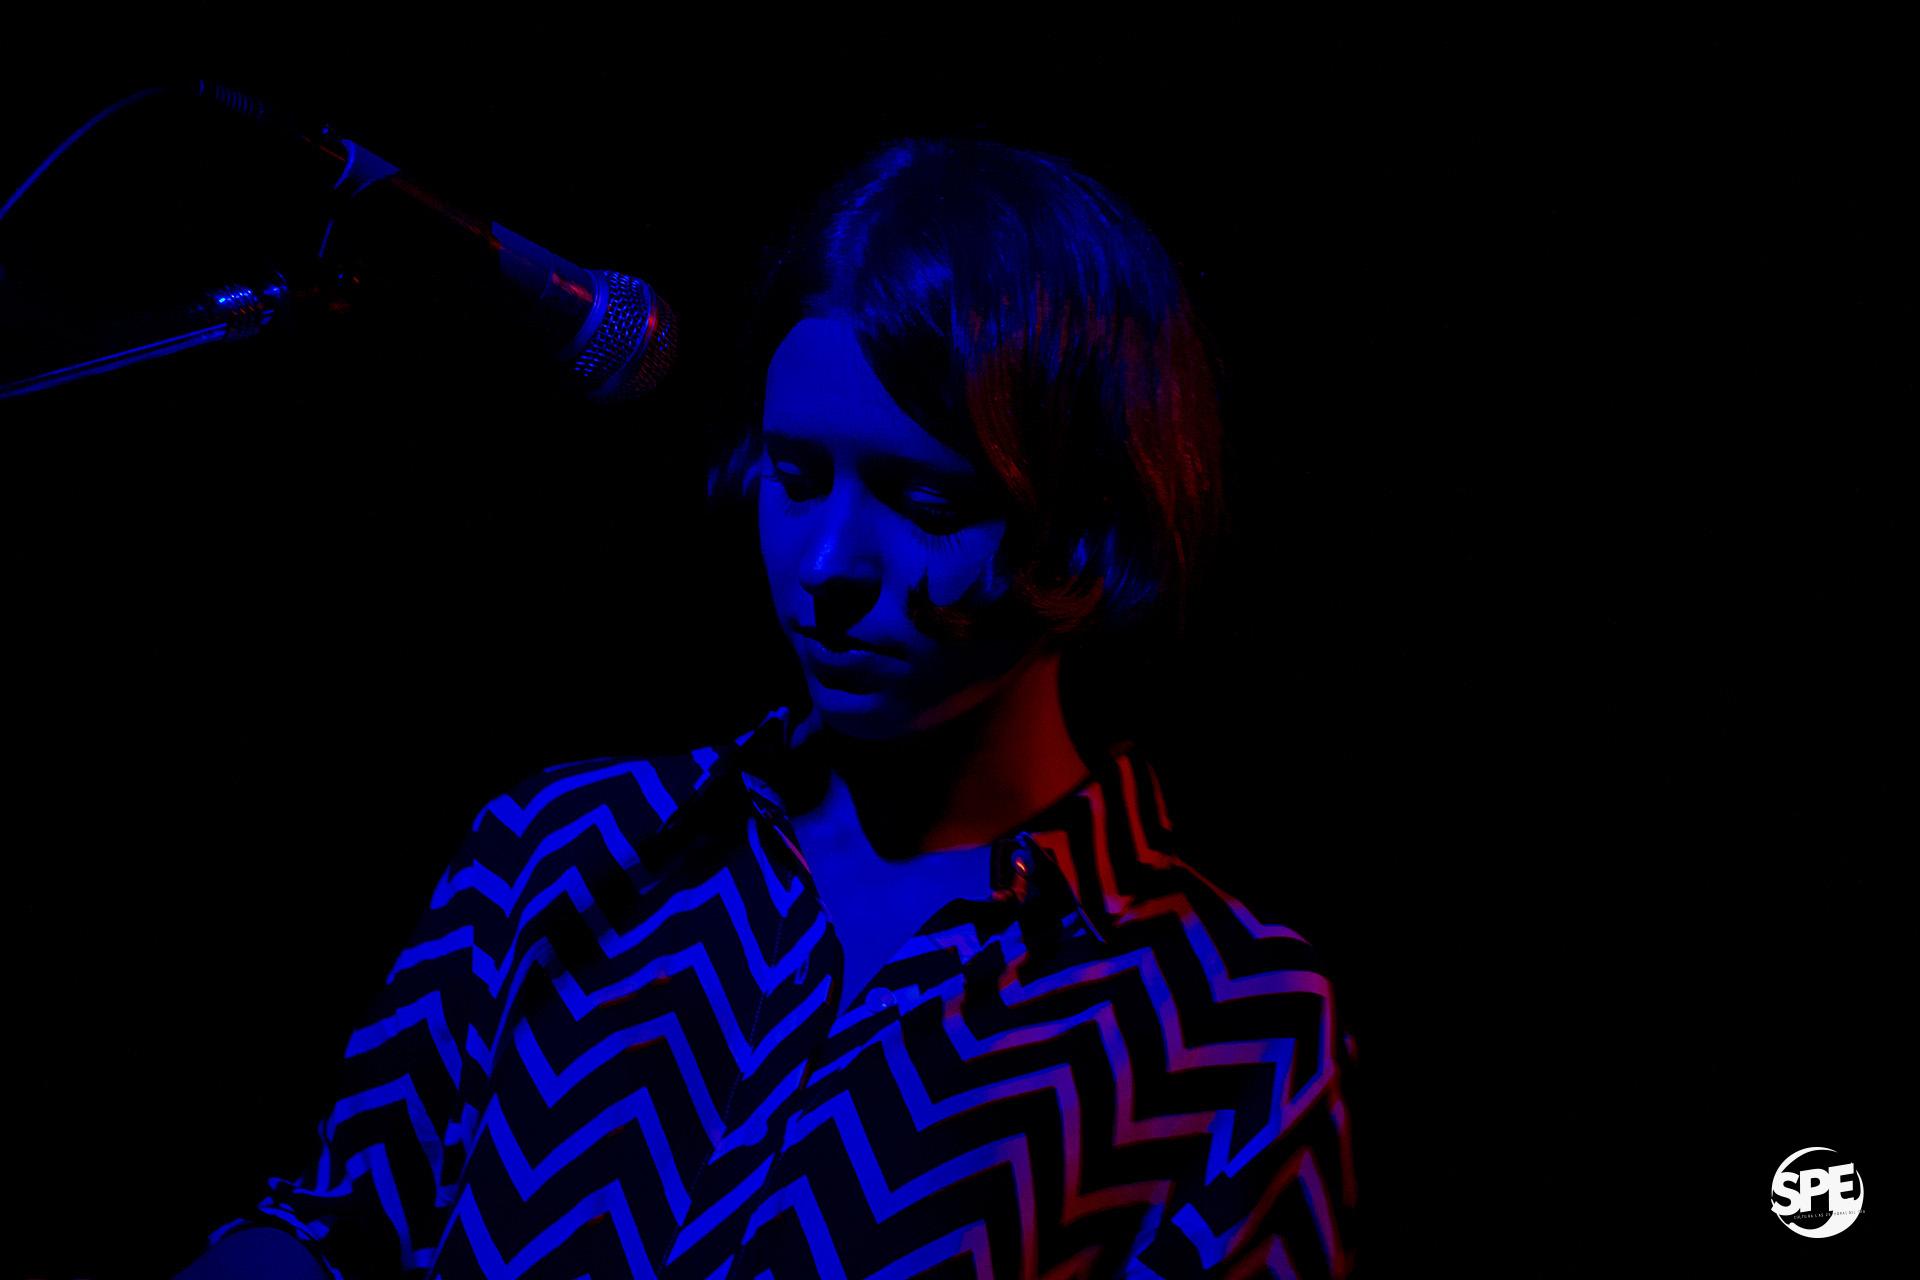 Tani-Yolanda-Festival-14-03-2018-Natalia-Vidal-Solo-Para-Entendidos_28.jpg